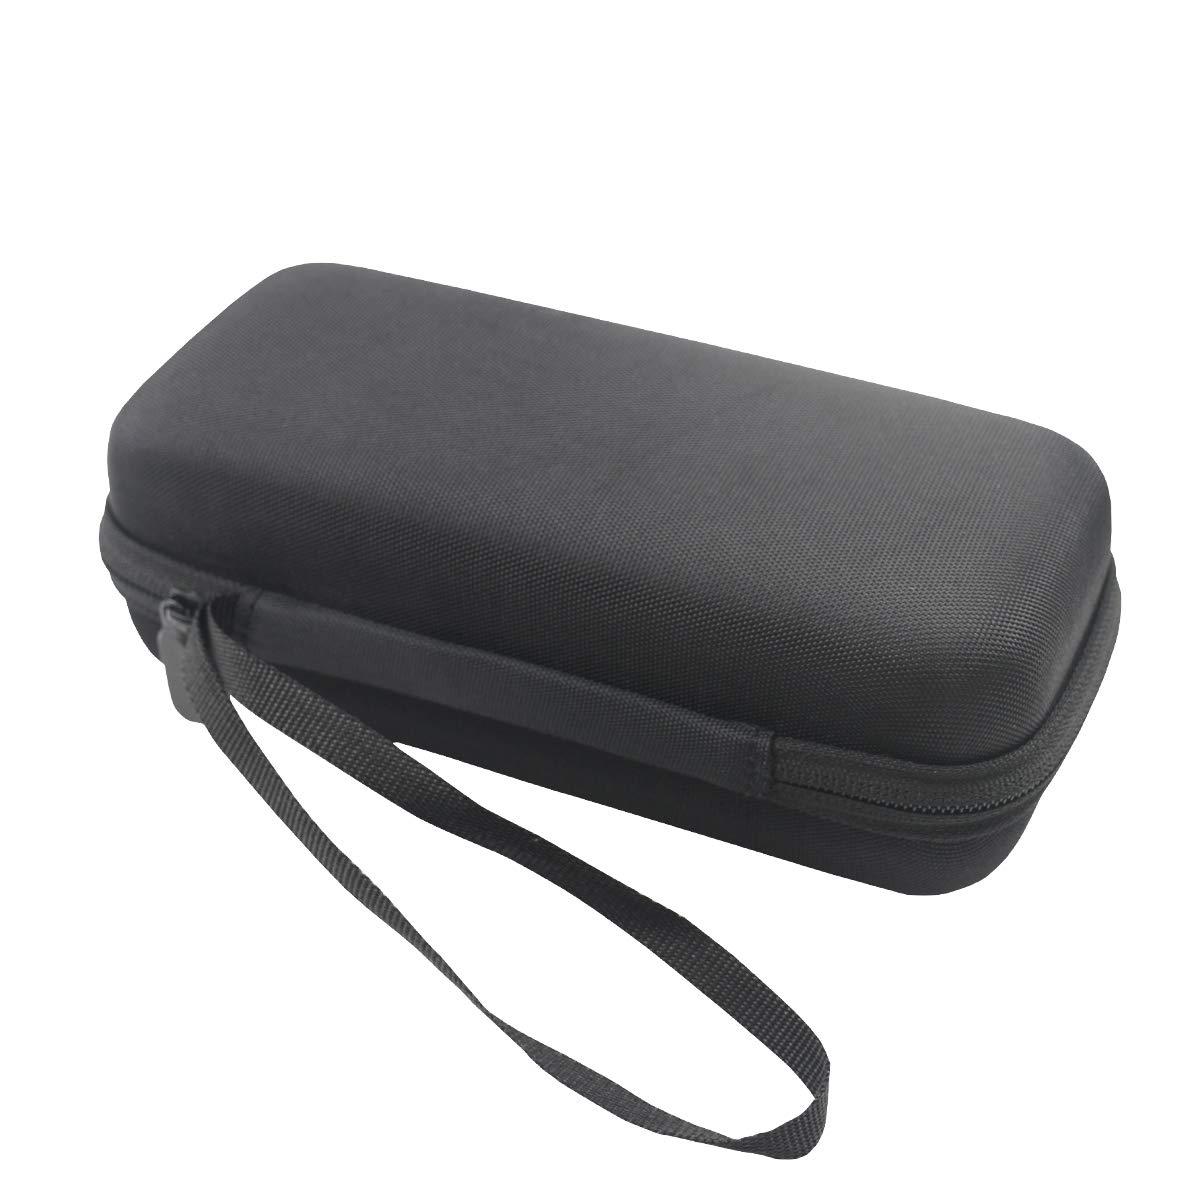 26800 Premium Portable Charger High Capacity External Battery Power Bank Travel Case SANVSEN Hard Travel Case Bag for Anker PowerCore